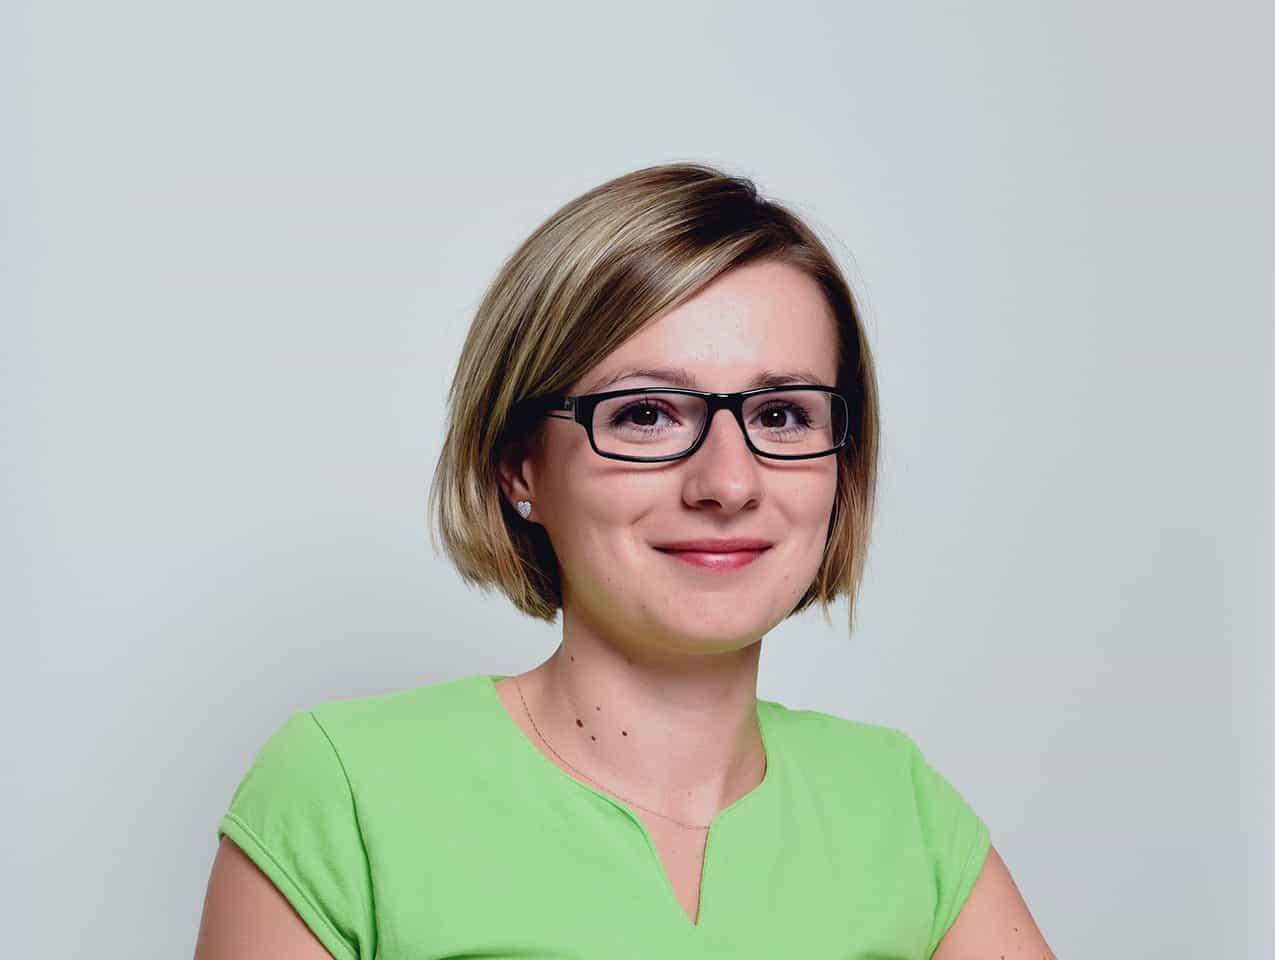 MUDr. Veronika Kovacova